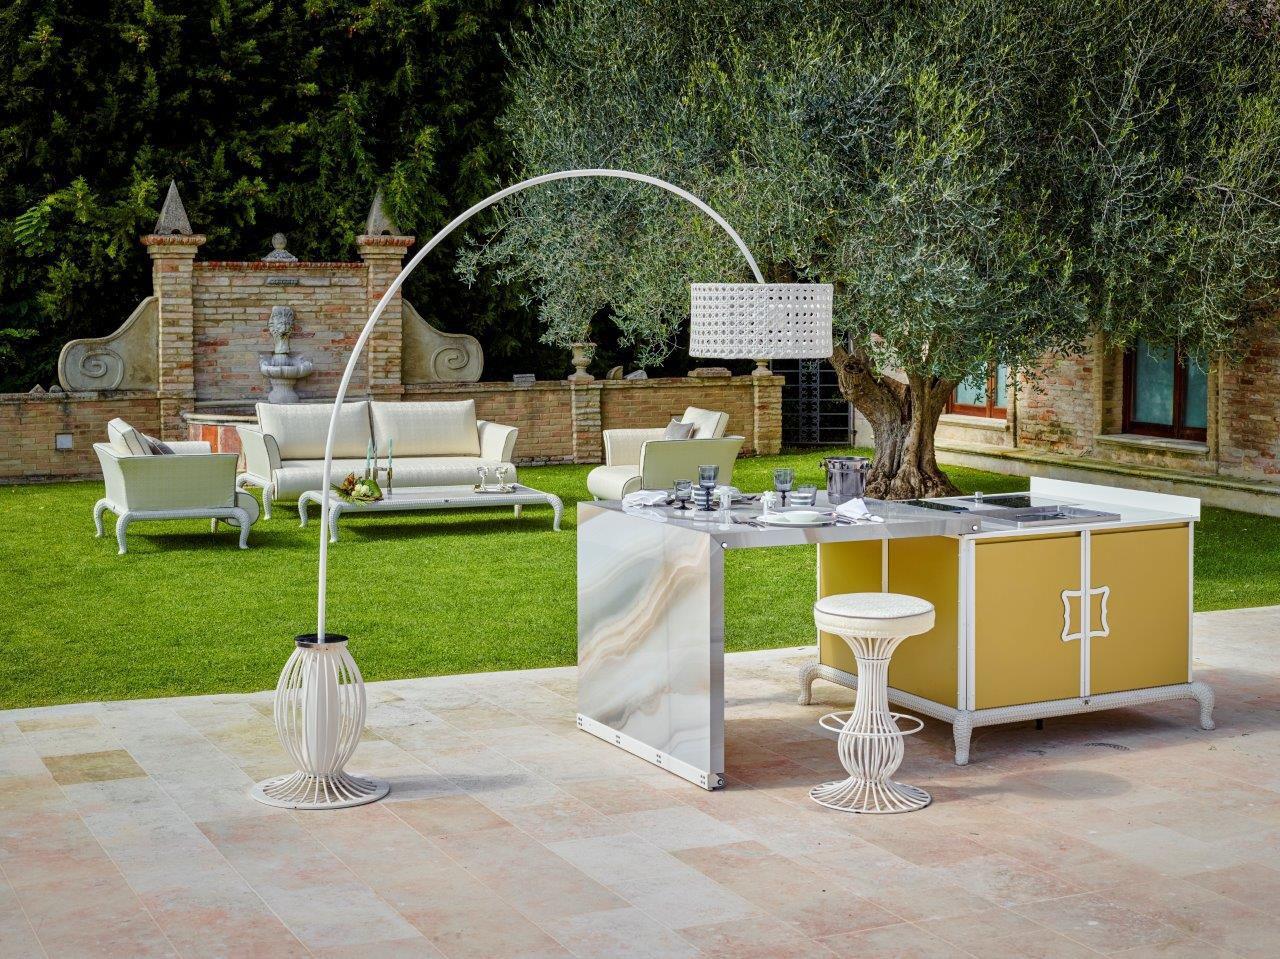 outdoor kitchen modules range 现代风格厨房 粉末涂层钢 瓷质 户外 island samuele mazza by dfn